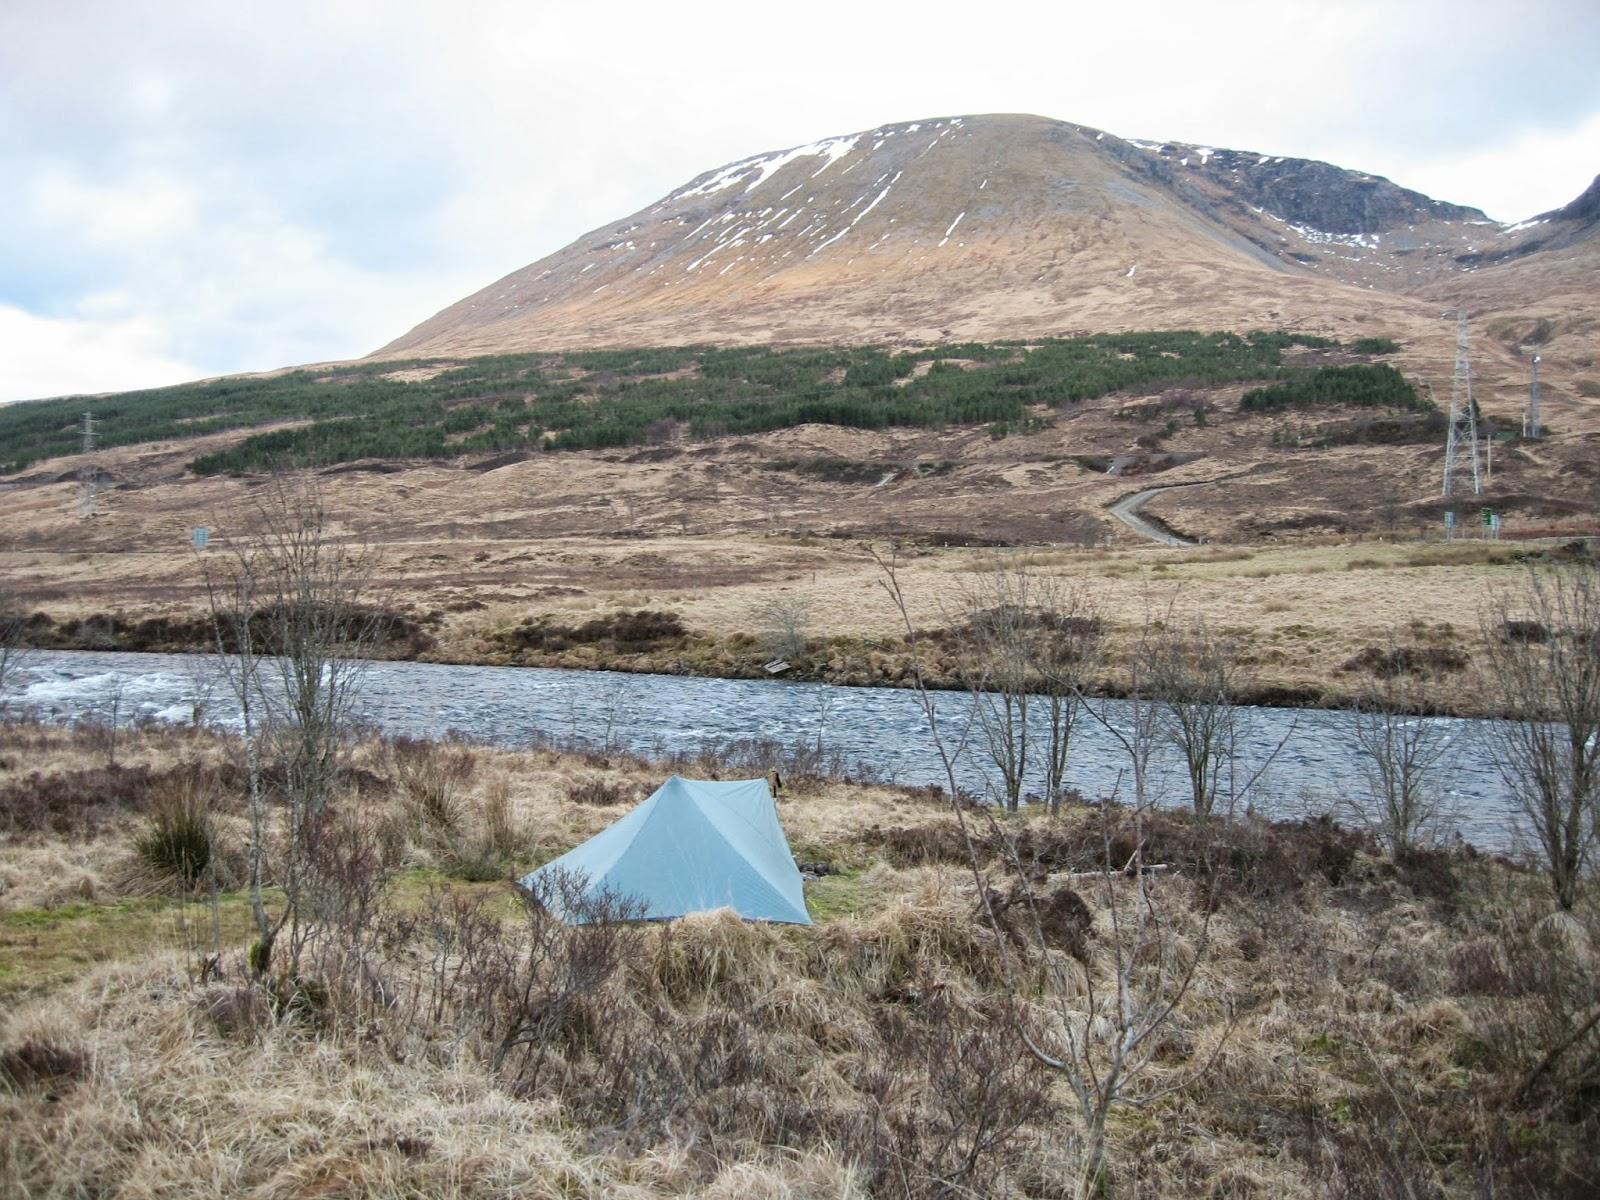 http://4.bp.blogspot.com/-8b_Y9OwuPtw/UjW8I_hDtjI/AAAAAAAAFbU/XraFeMJ65jI/s1600/Scotland+February+2011+014.JPG